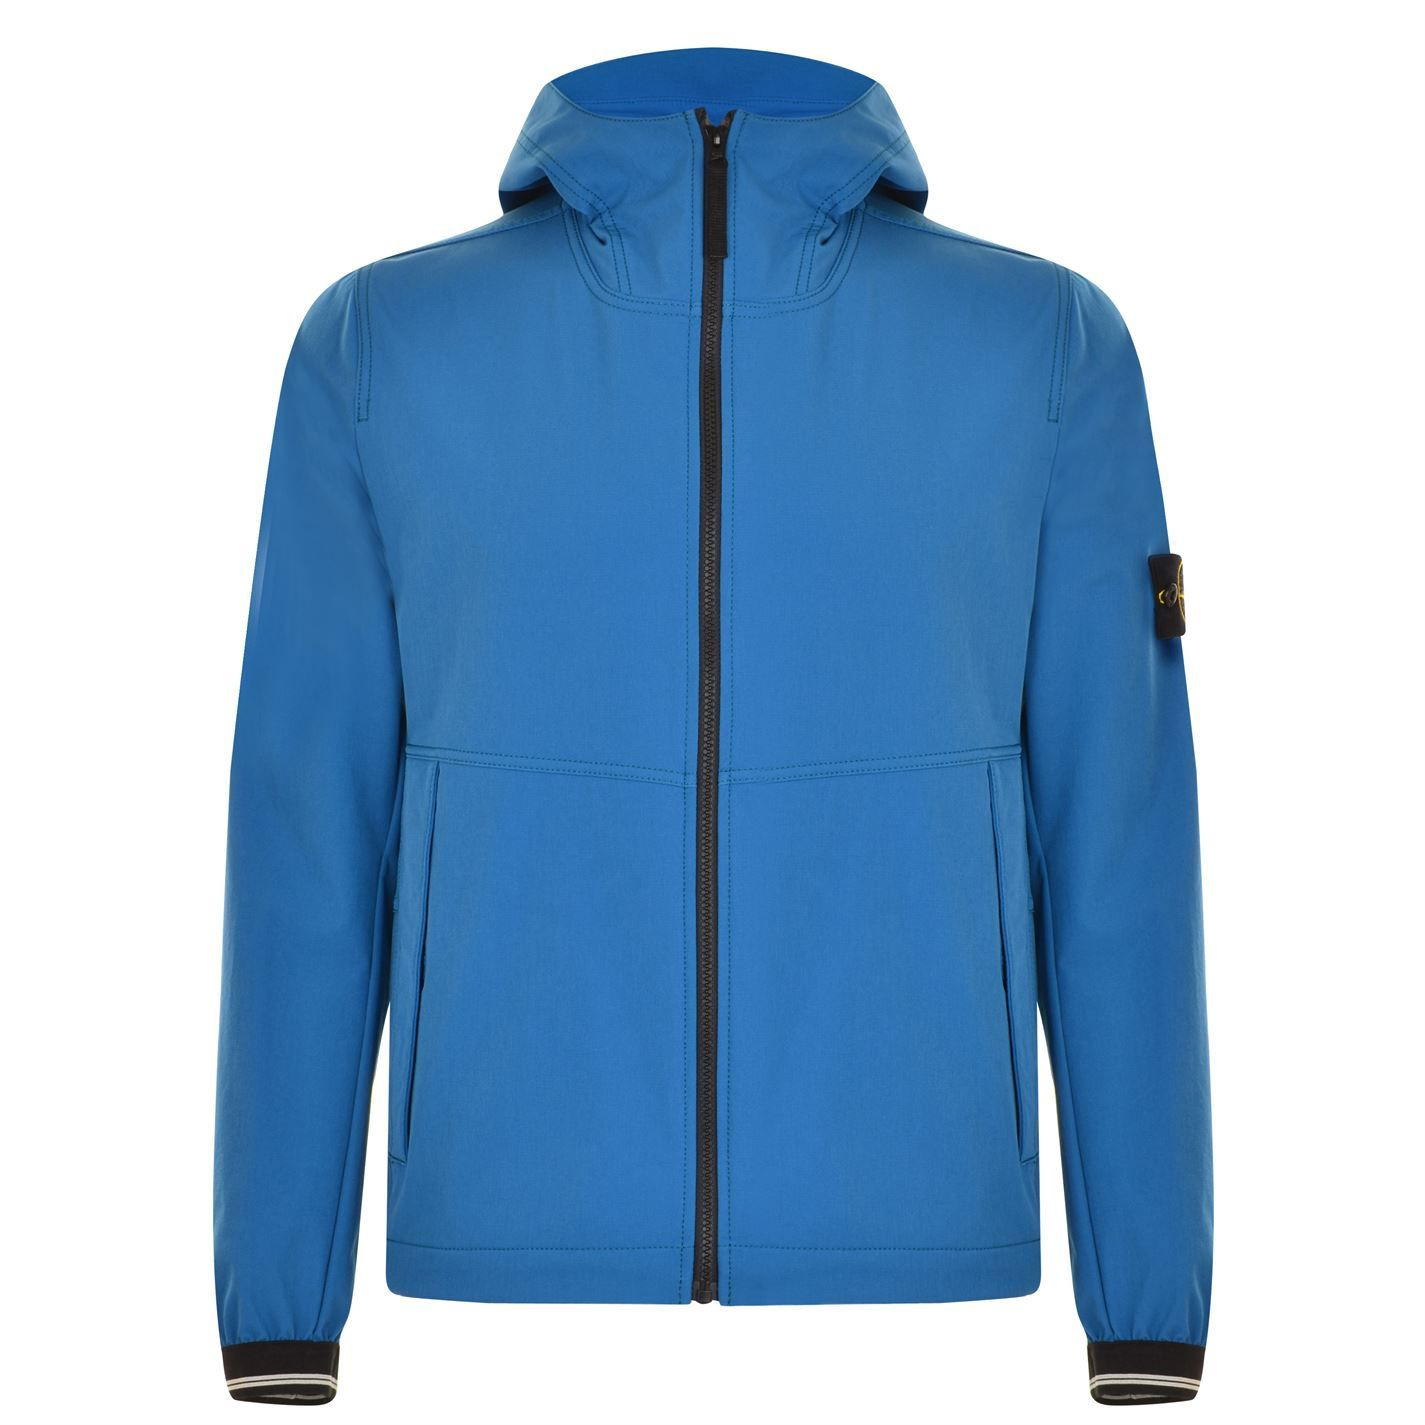 100% authentic 6e6bf 44b08 Stone Island | Comfort Shell Jacket | Threads | Stone island ...